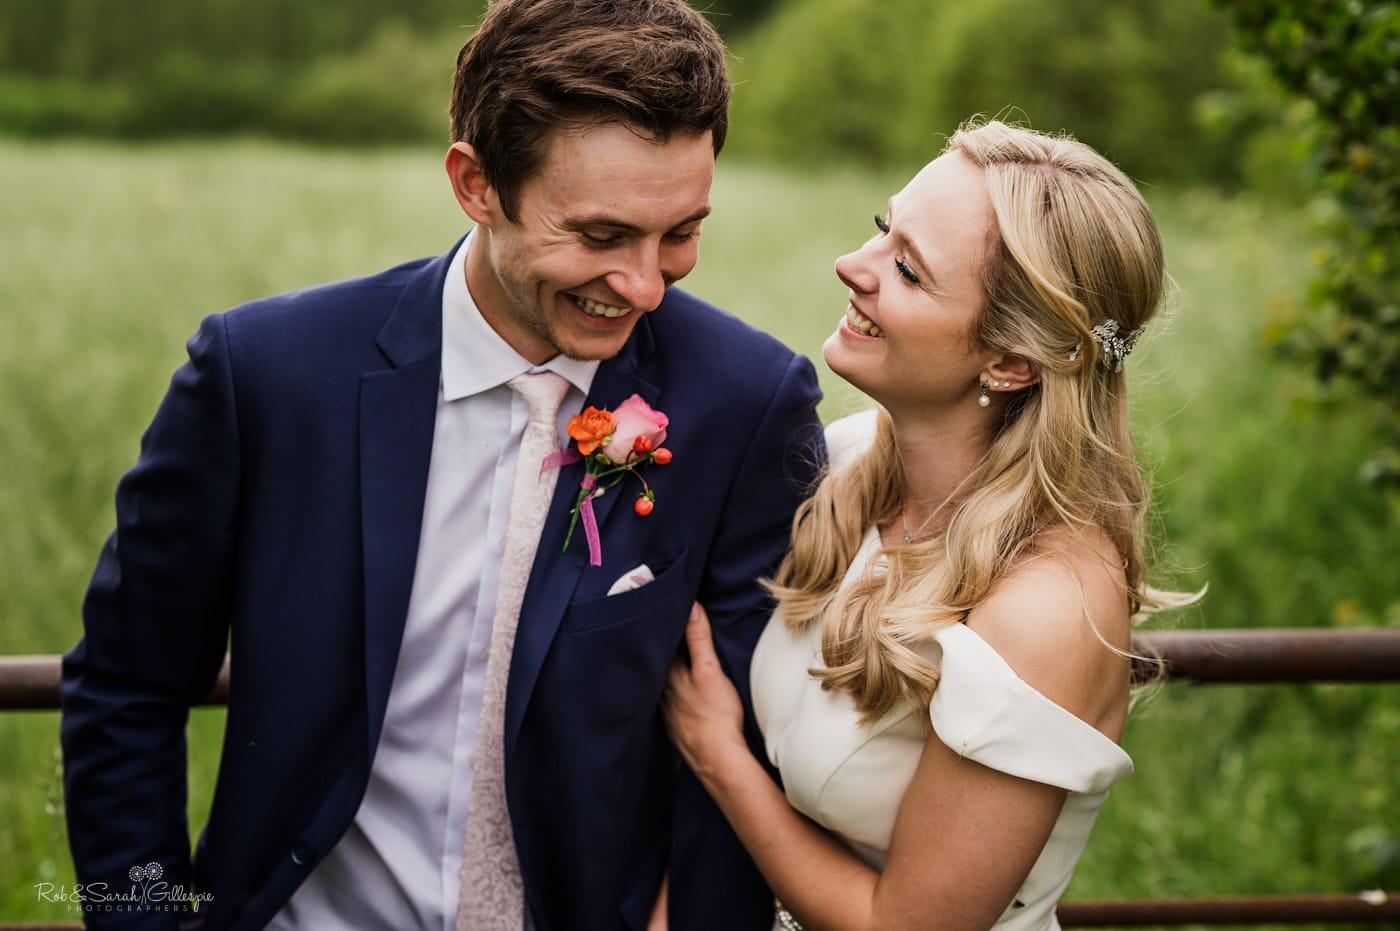 Wedding at village hall in Worcesterrshire